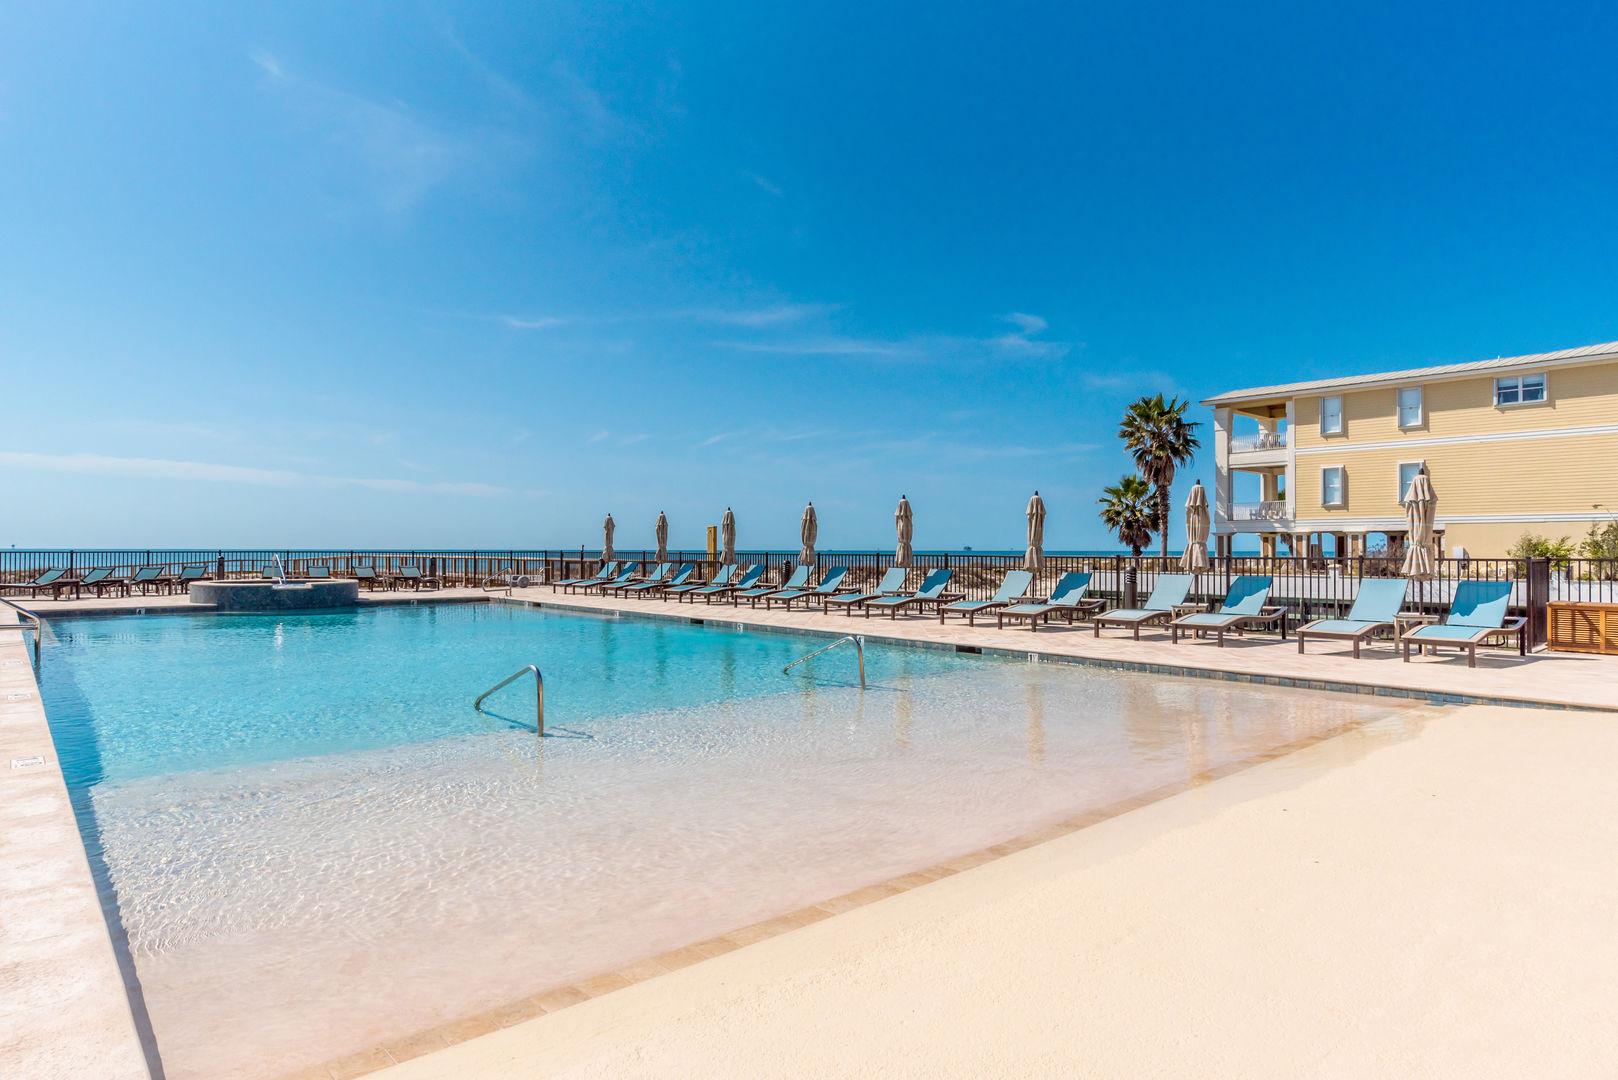 The Kiva Club has a beachfront pool.